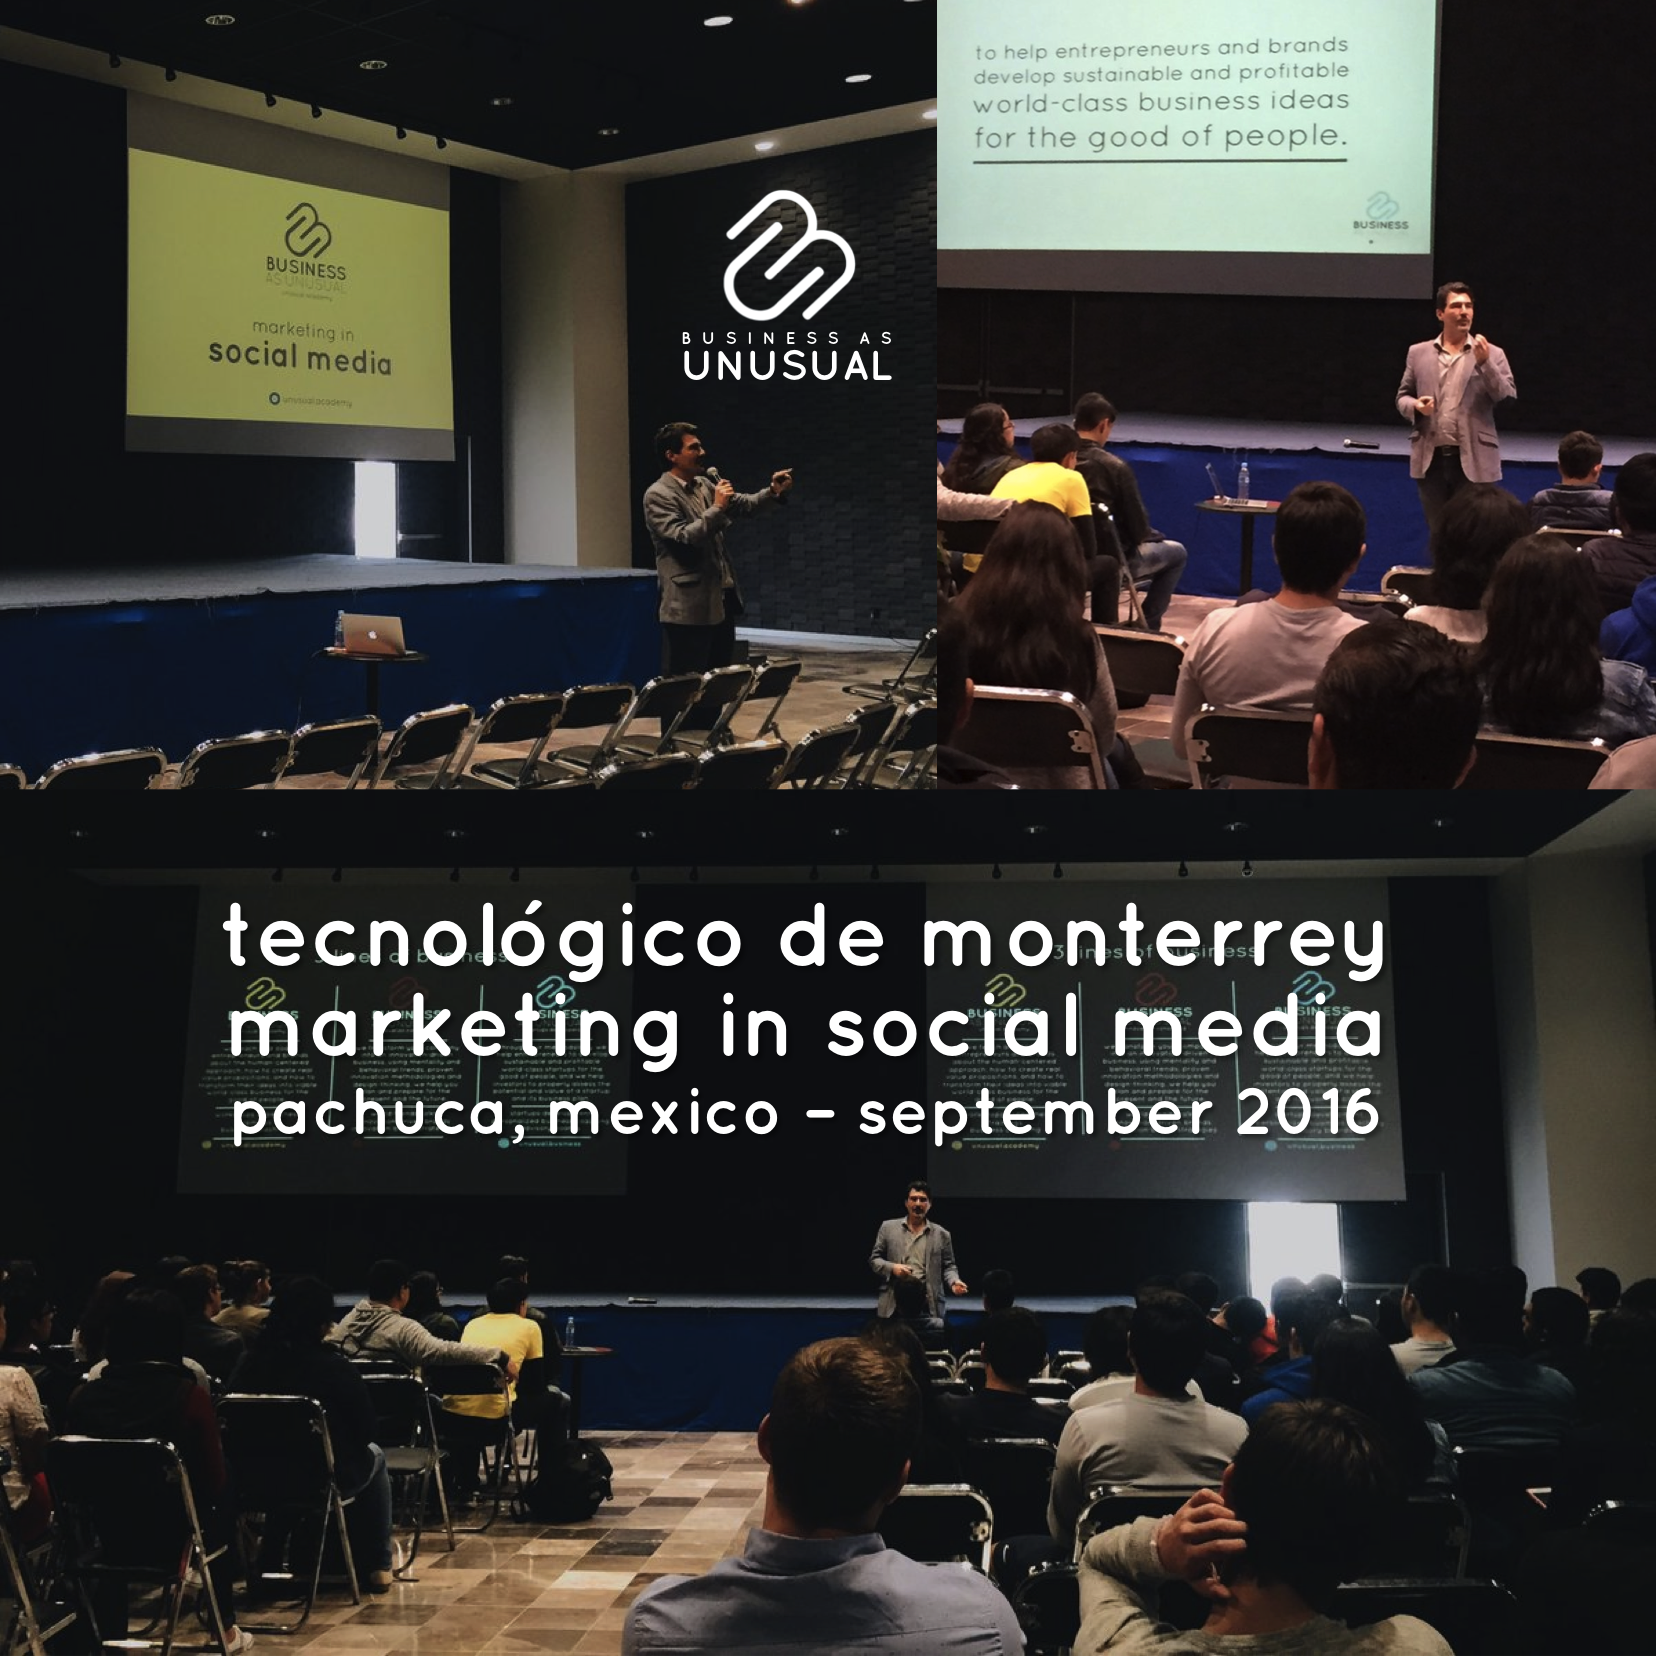 Instituto Tecnológico de Monterrey - Semana i - Pachuca 2016